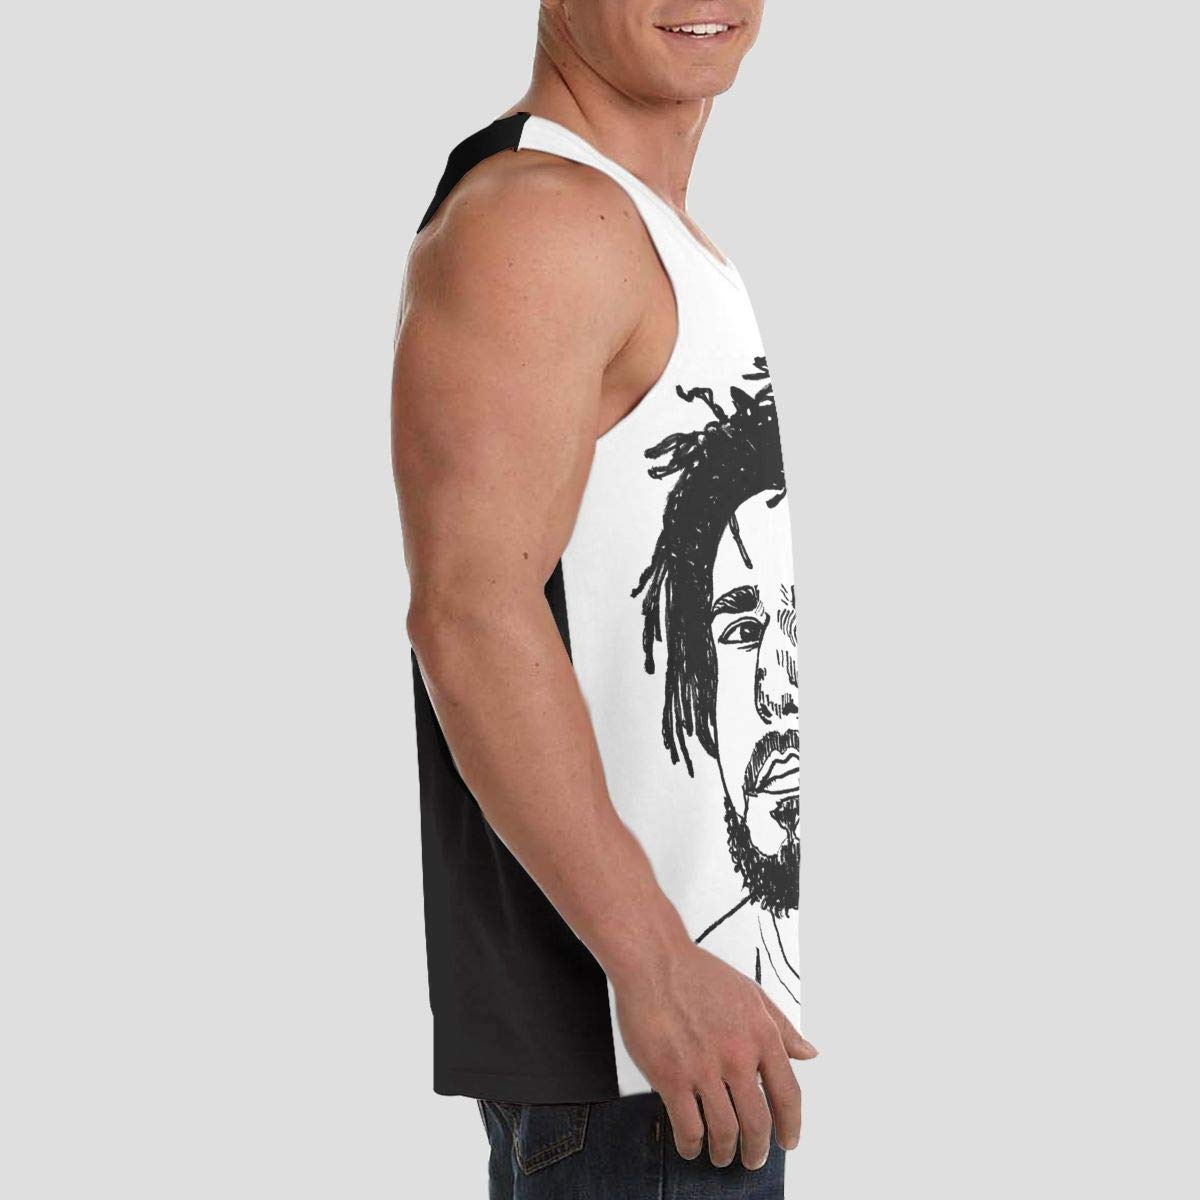 J Cole Mans Easy to Wear Sleeveless Tank Vest T-Shirt